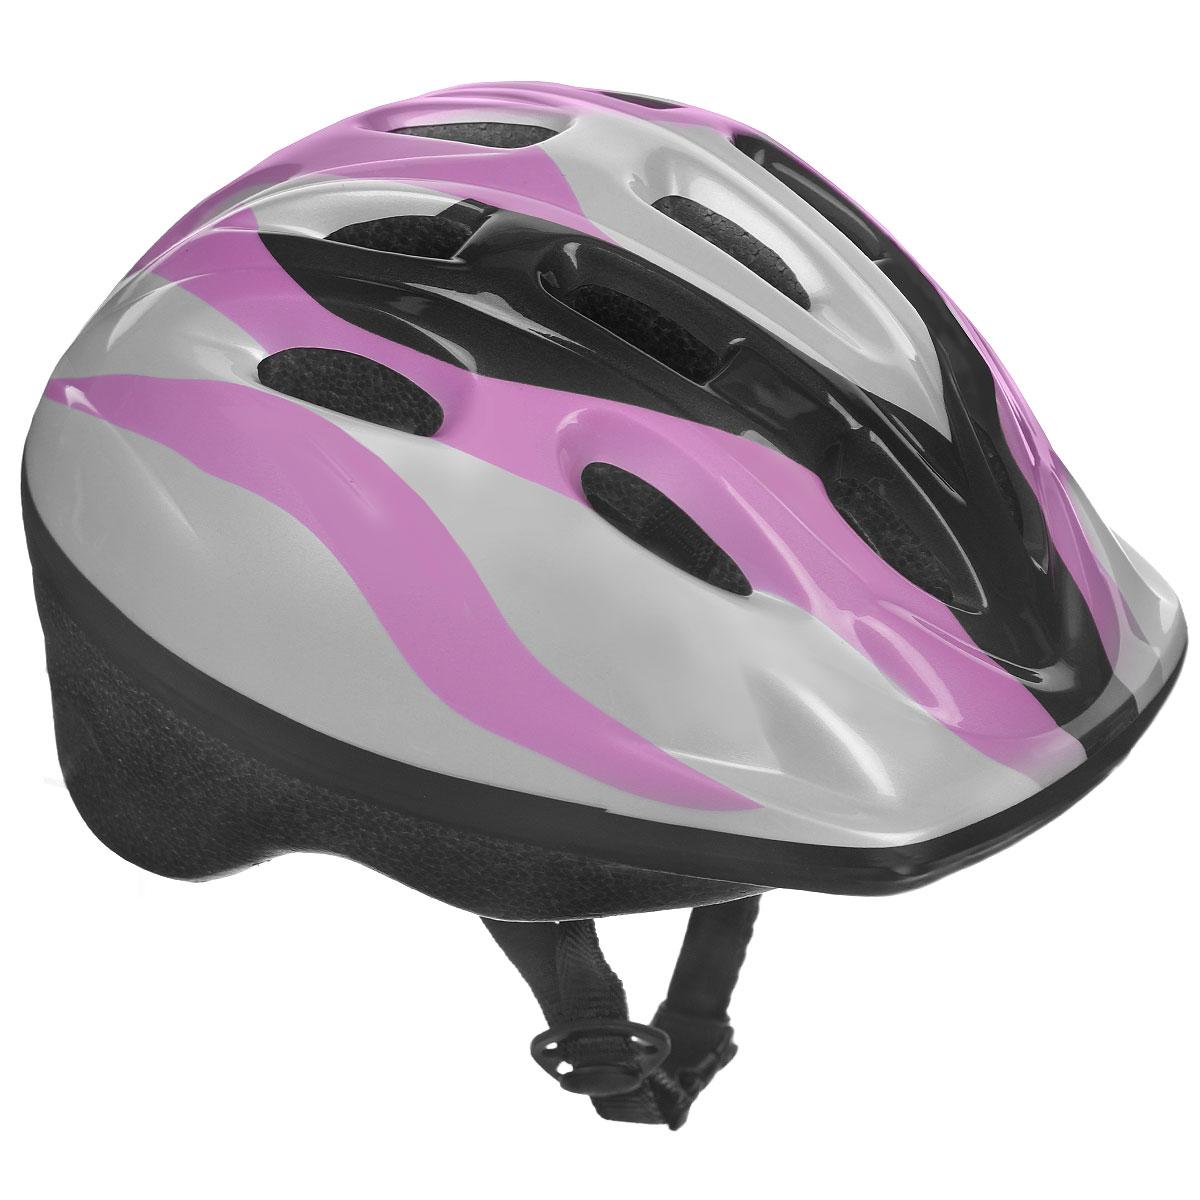 "Шлем защитный ""Action"", цвет: белый, черный, розовый. Размер XS (48-51). PWH-40"